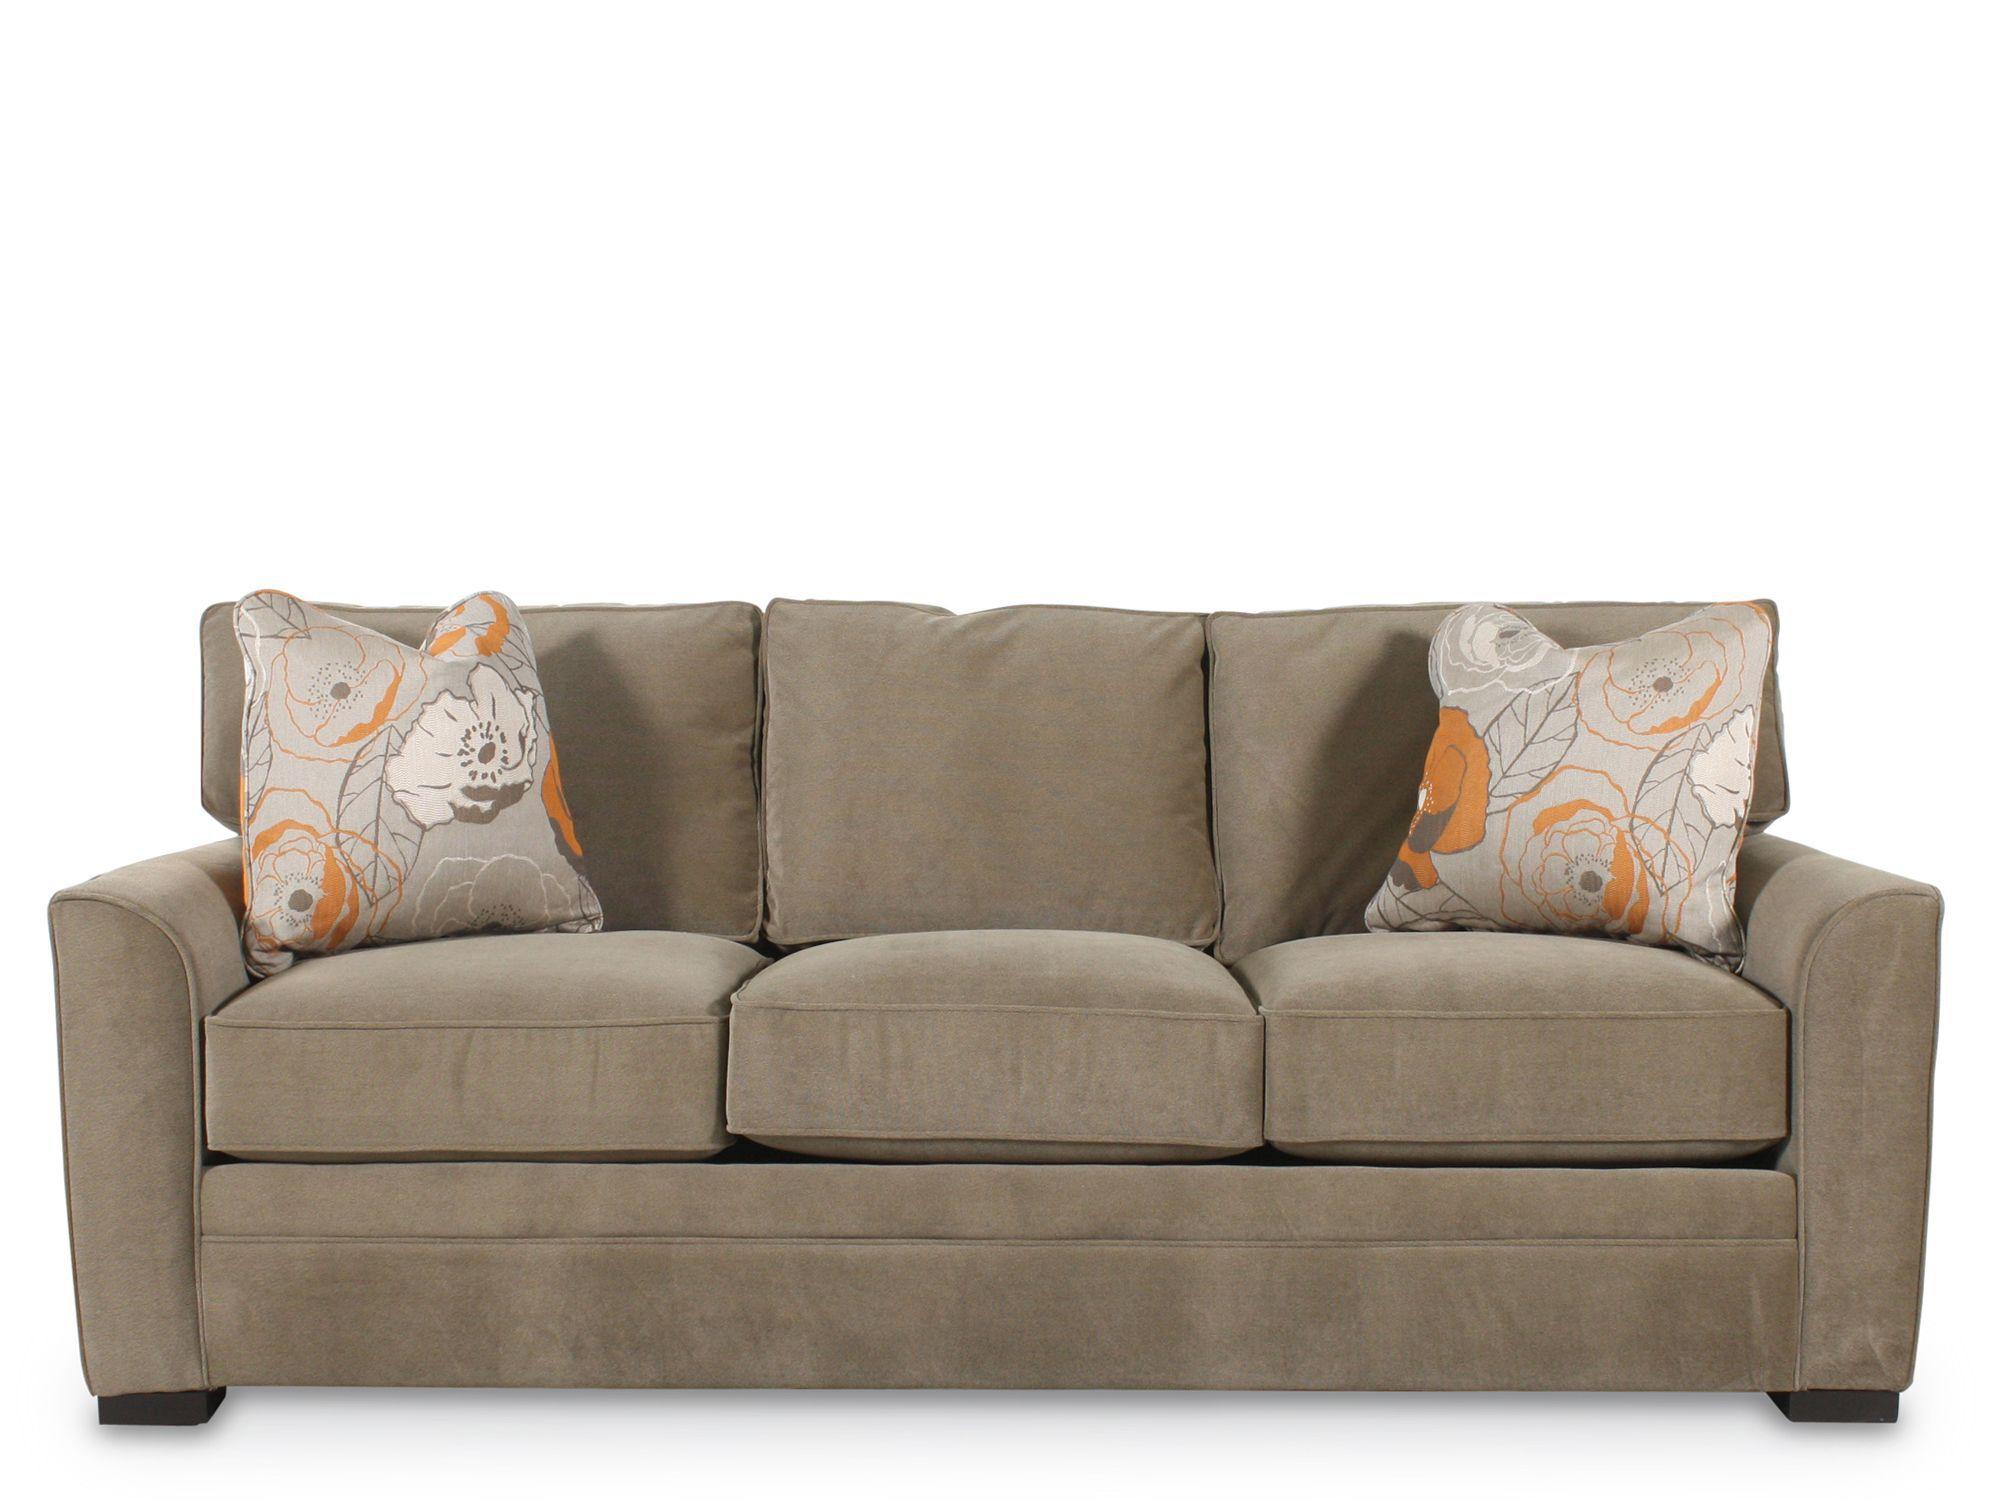 Captivating Jonathan Louis Queen Sleeper Sofa With Air Mattress